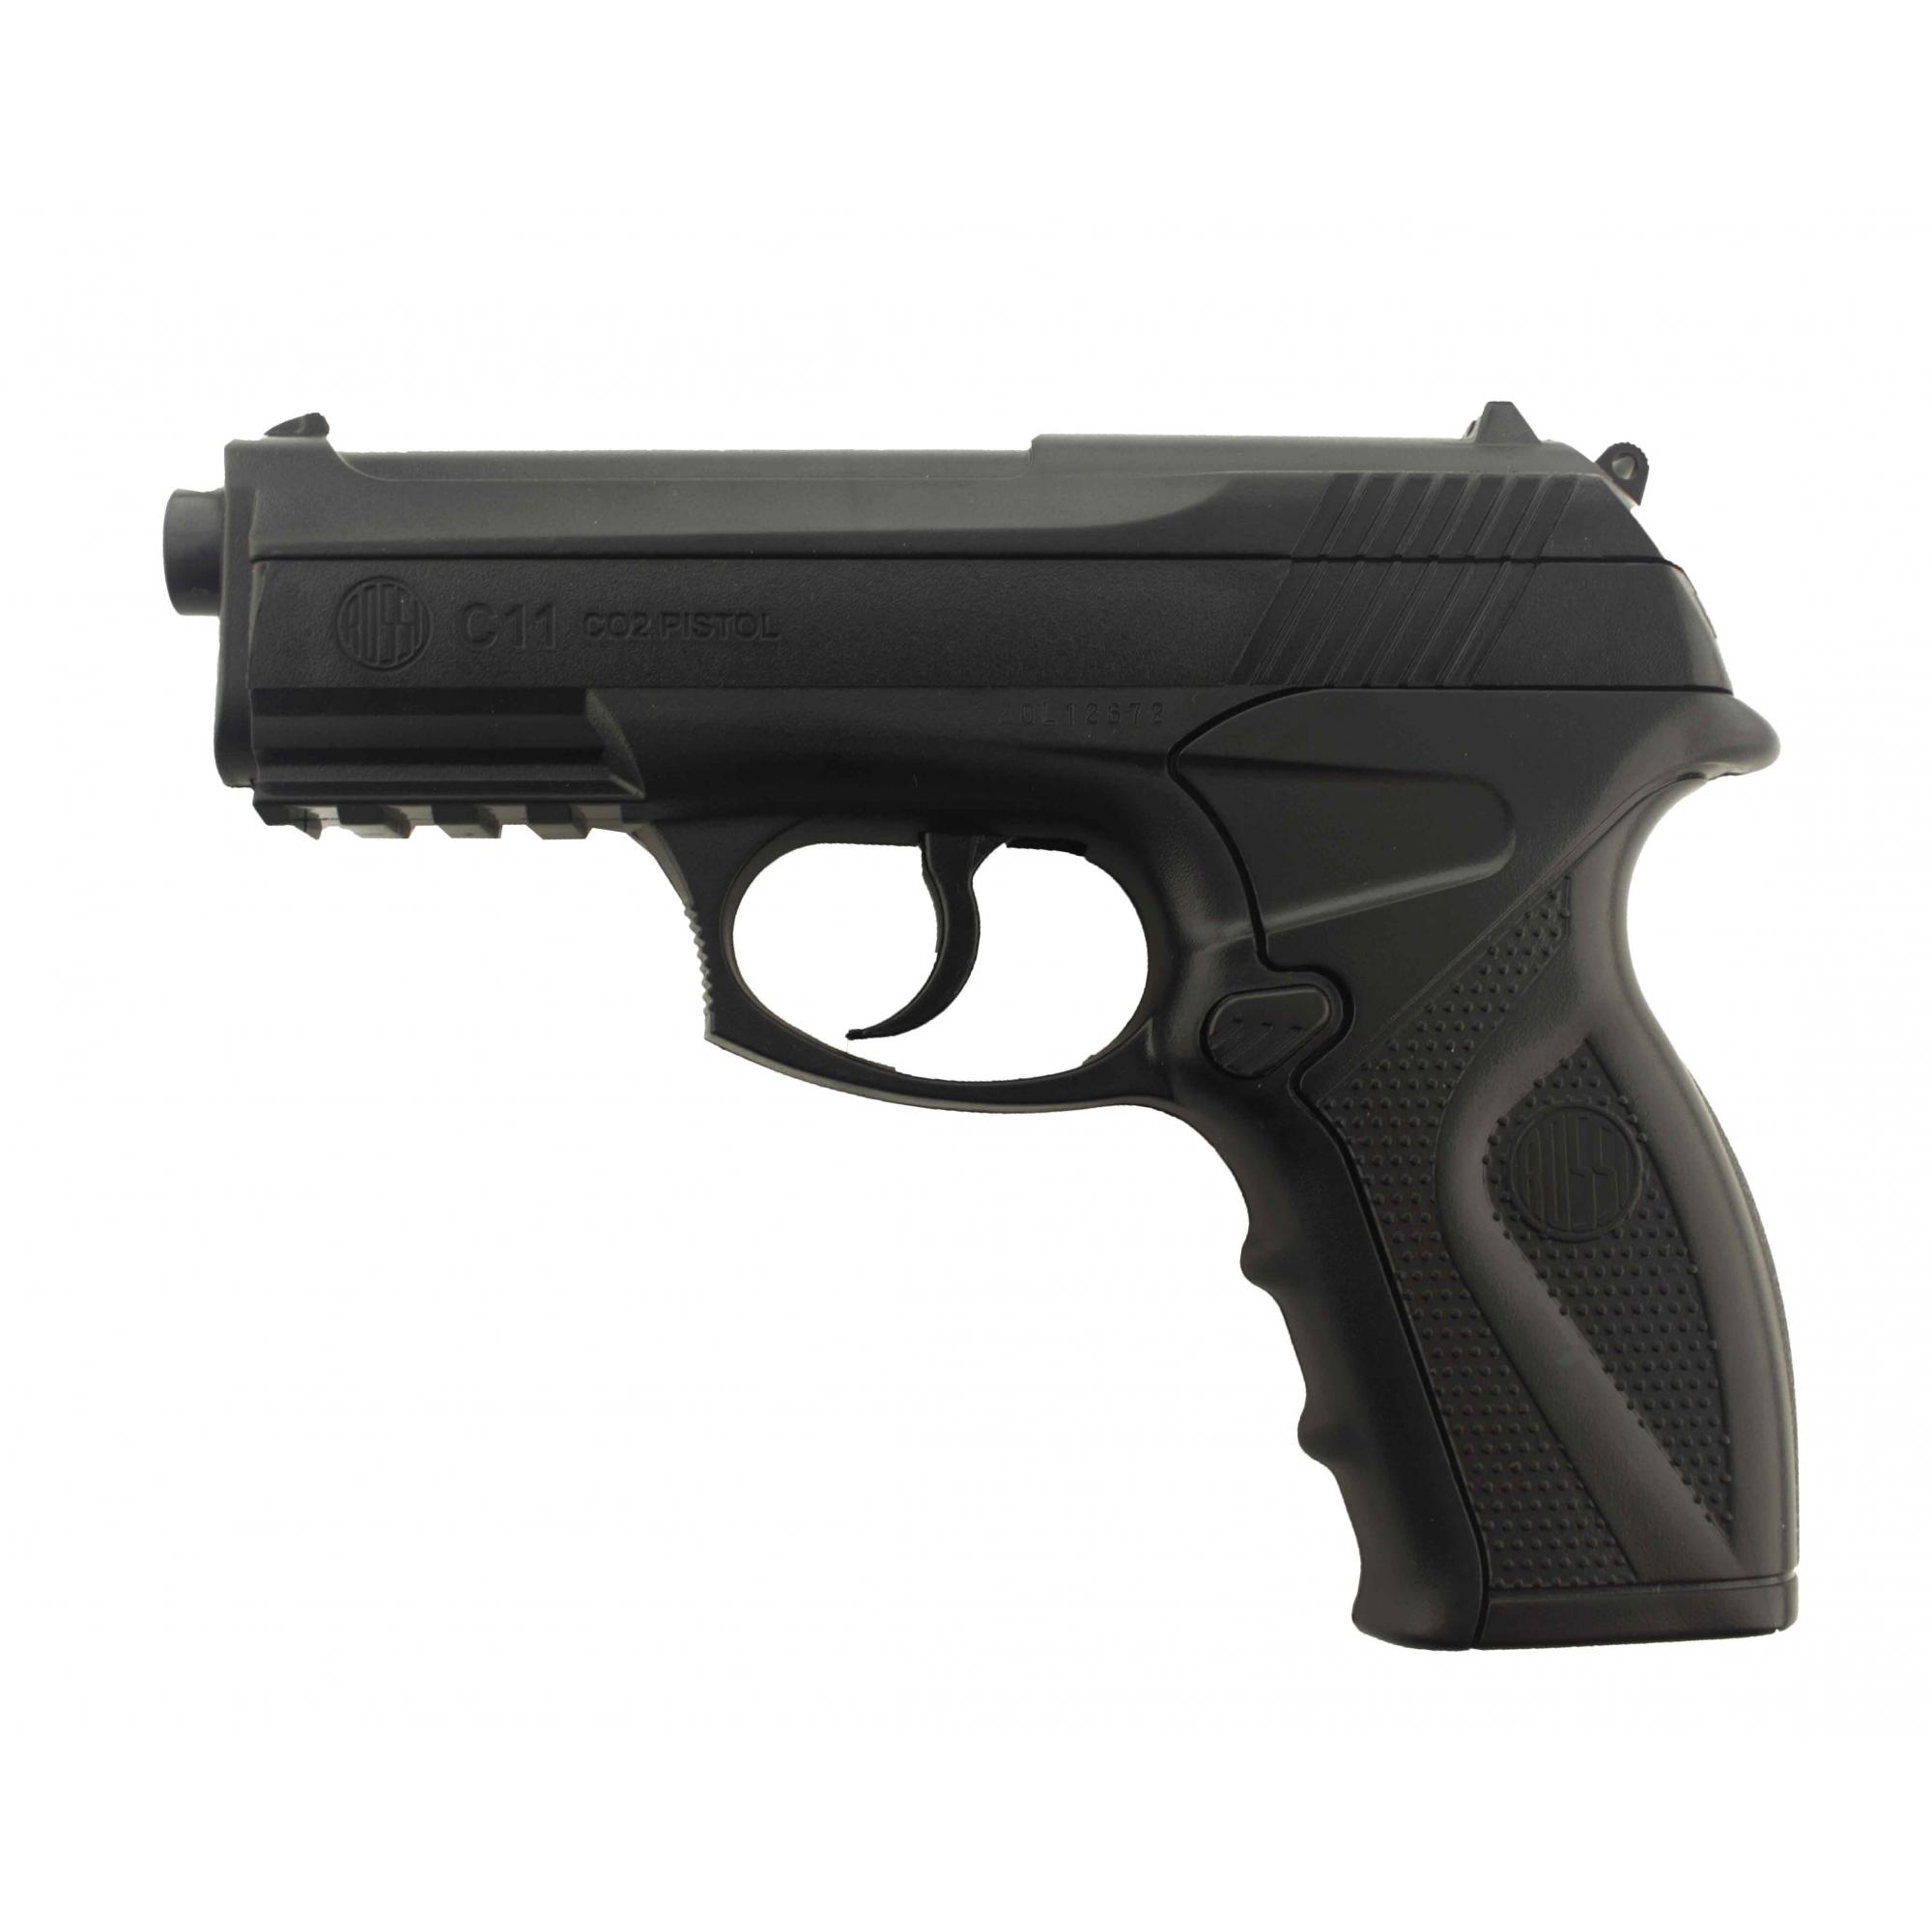 Pistola de Pressão Wingun C11 CO2 6mm Steel BB